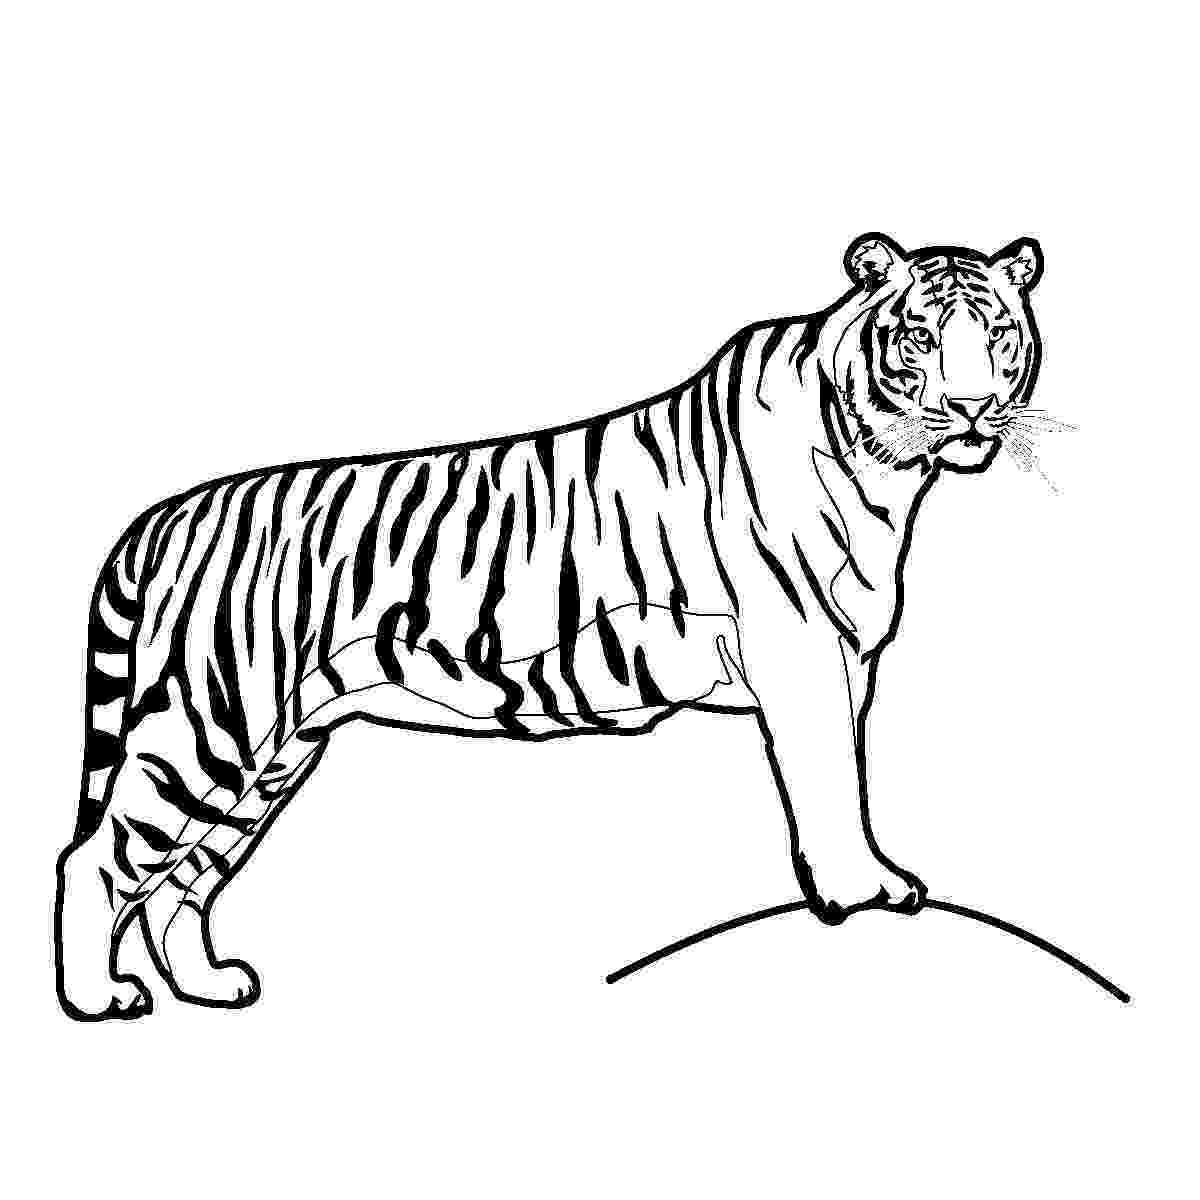 tiger printable free printable tiger coloring pages for kids tiger printable